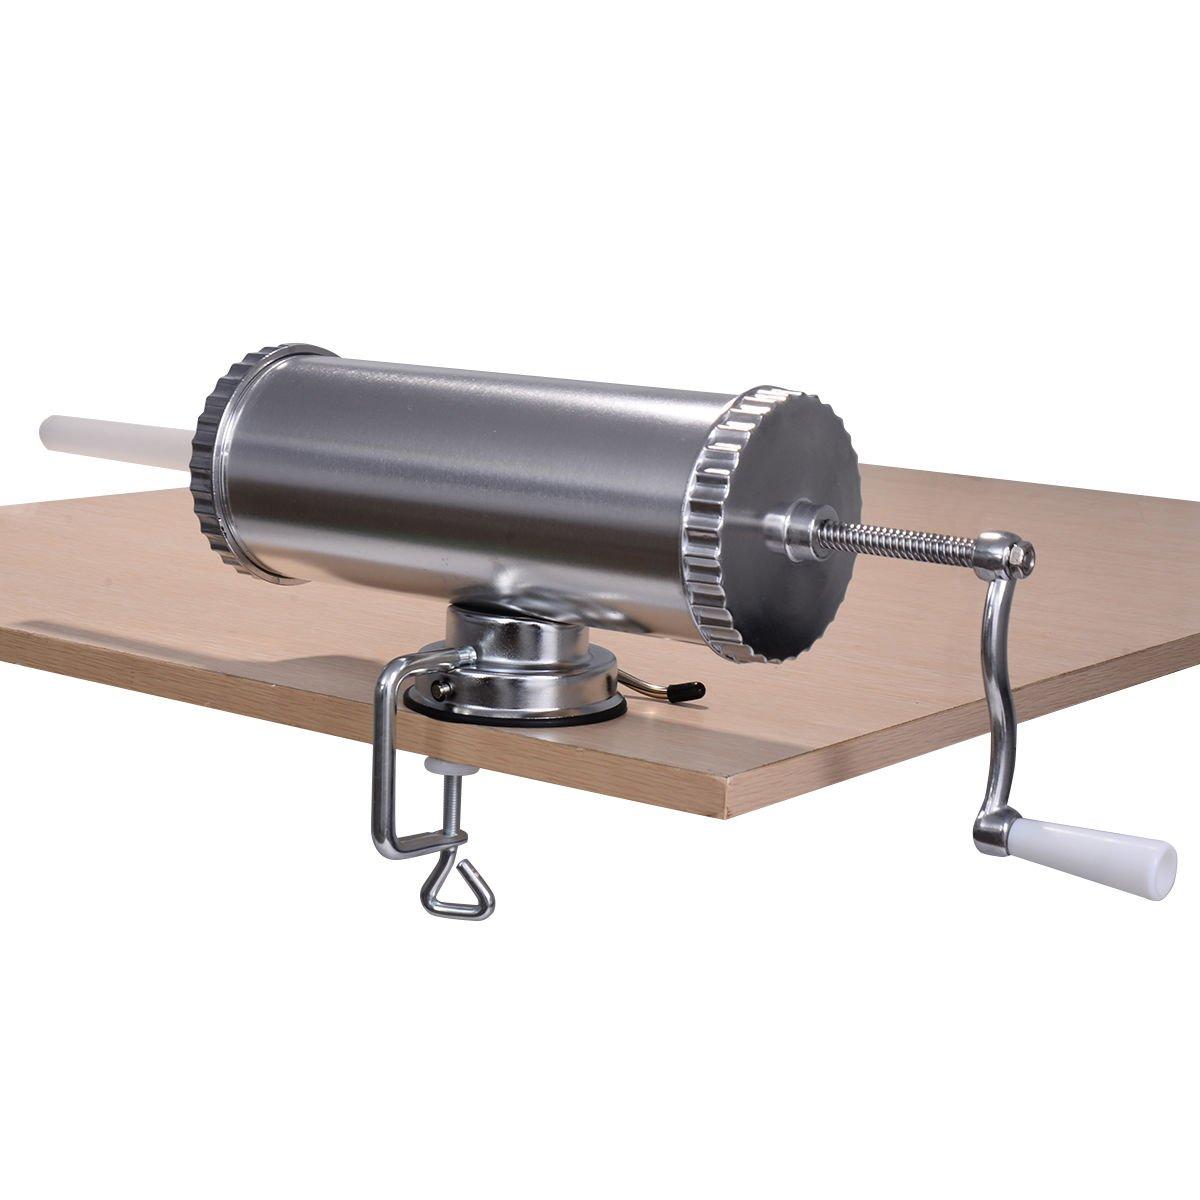 Goplus Stainless Steel Sausage Stuffer Maker Meat Filler Commercial (3L)